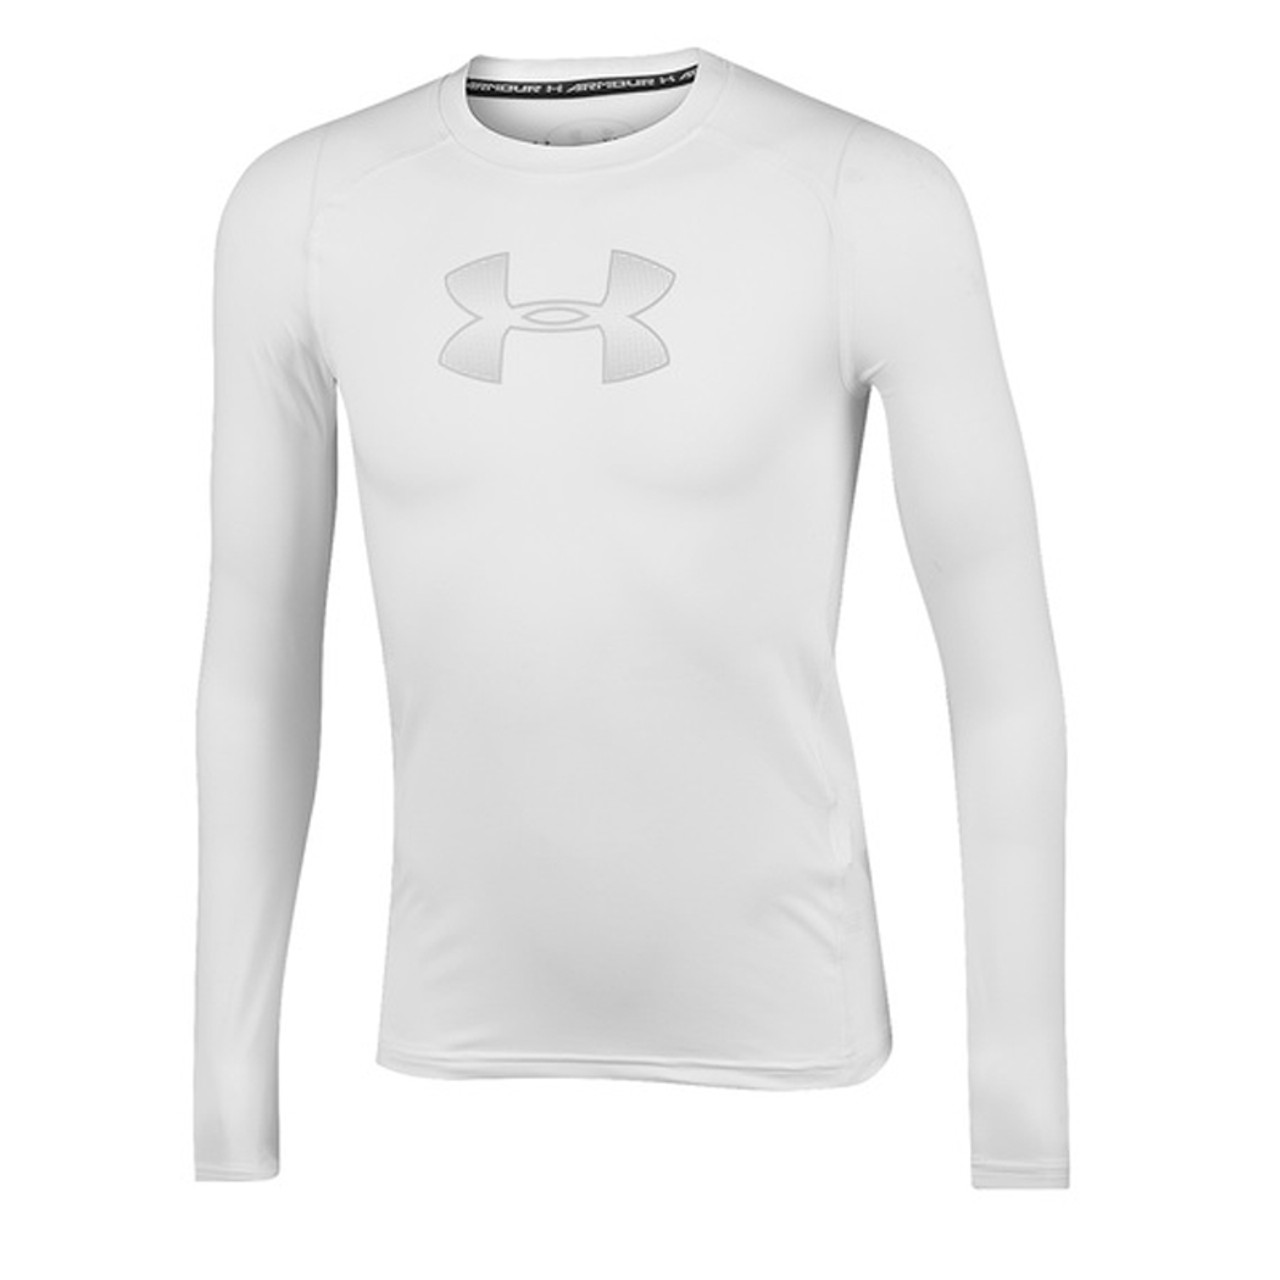 Large Under Armour Men/'s UA Reflex Long Sleeve Goalkeeper Jersey Yellow